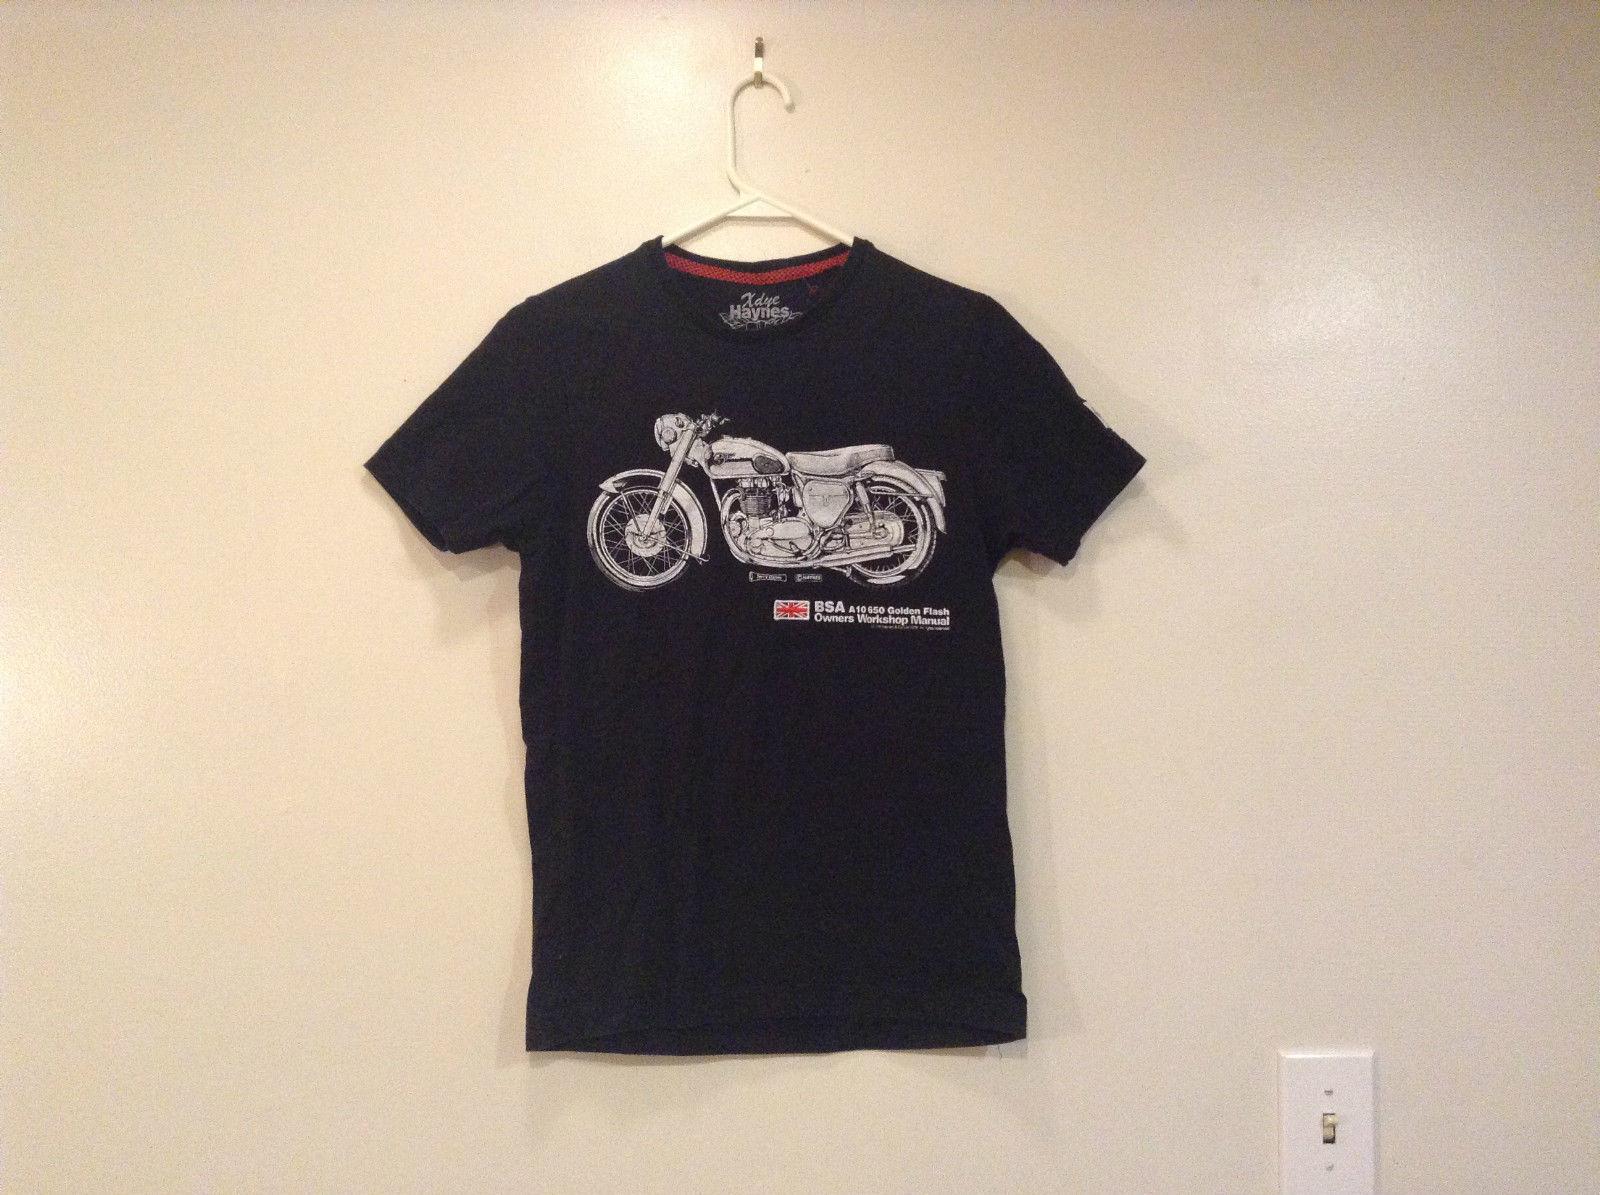 X Dye Haynes Terry Davey UK flag motorcycle Short Sleeve Cotton T Shirt Size S